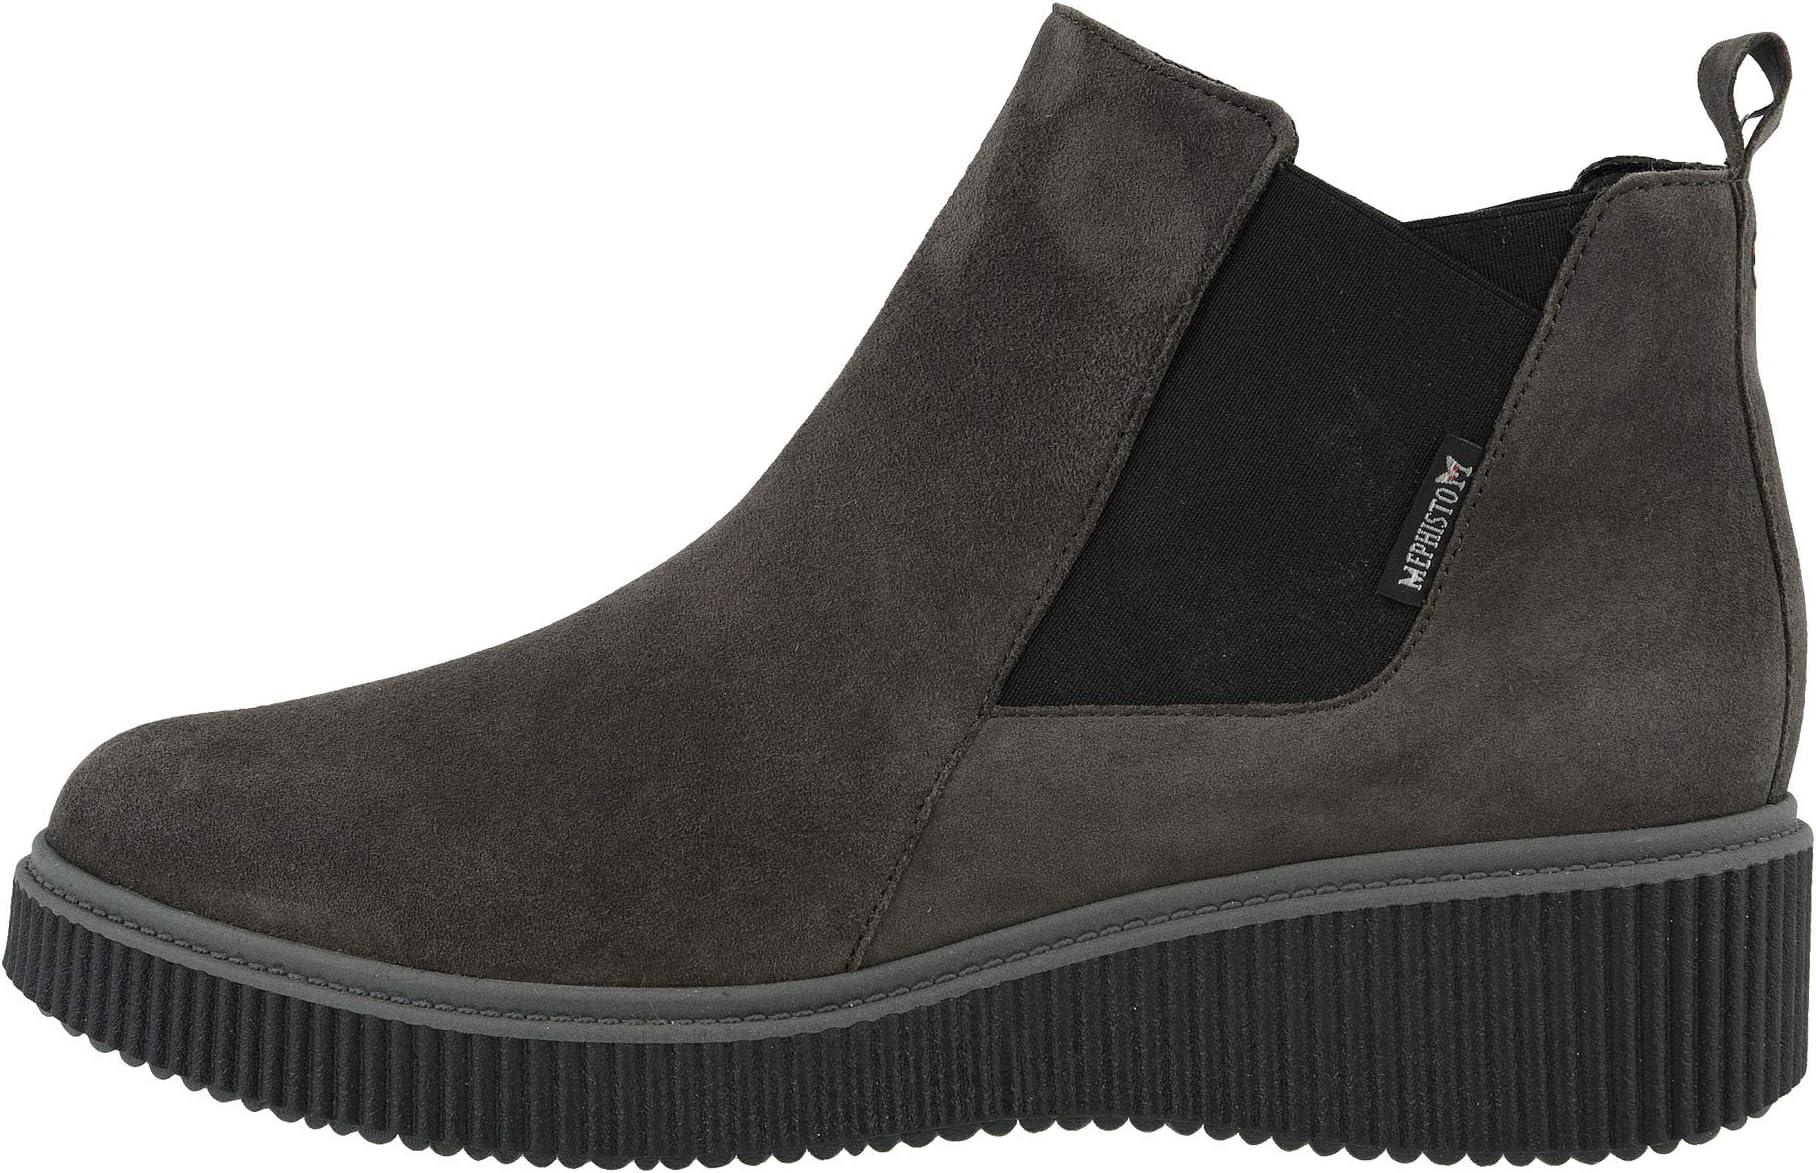 Mephisto Emie | Women's shoes | 2020 Newest